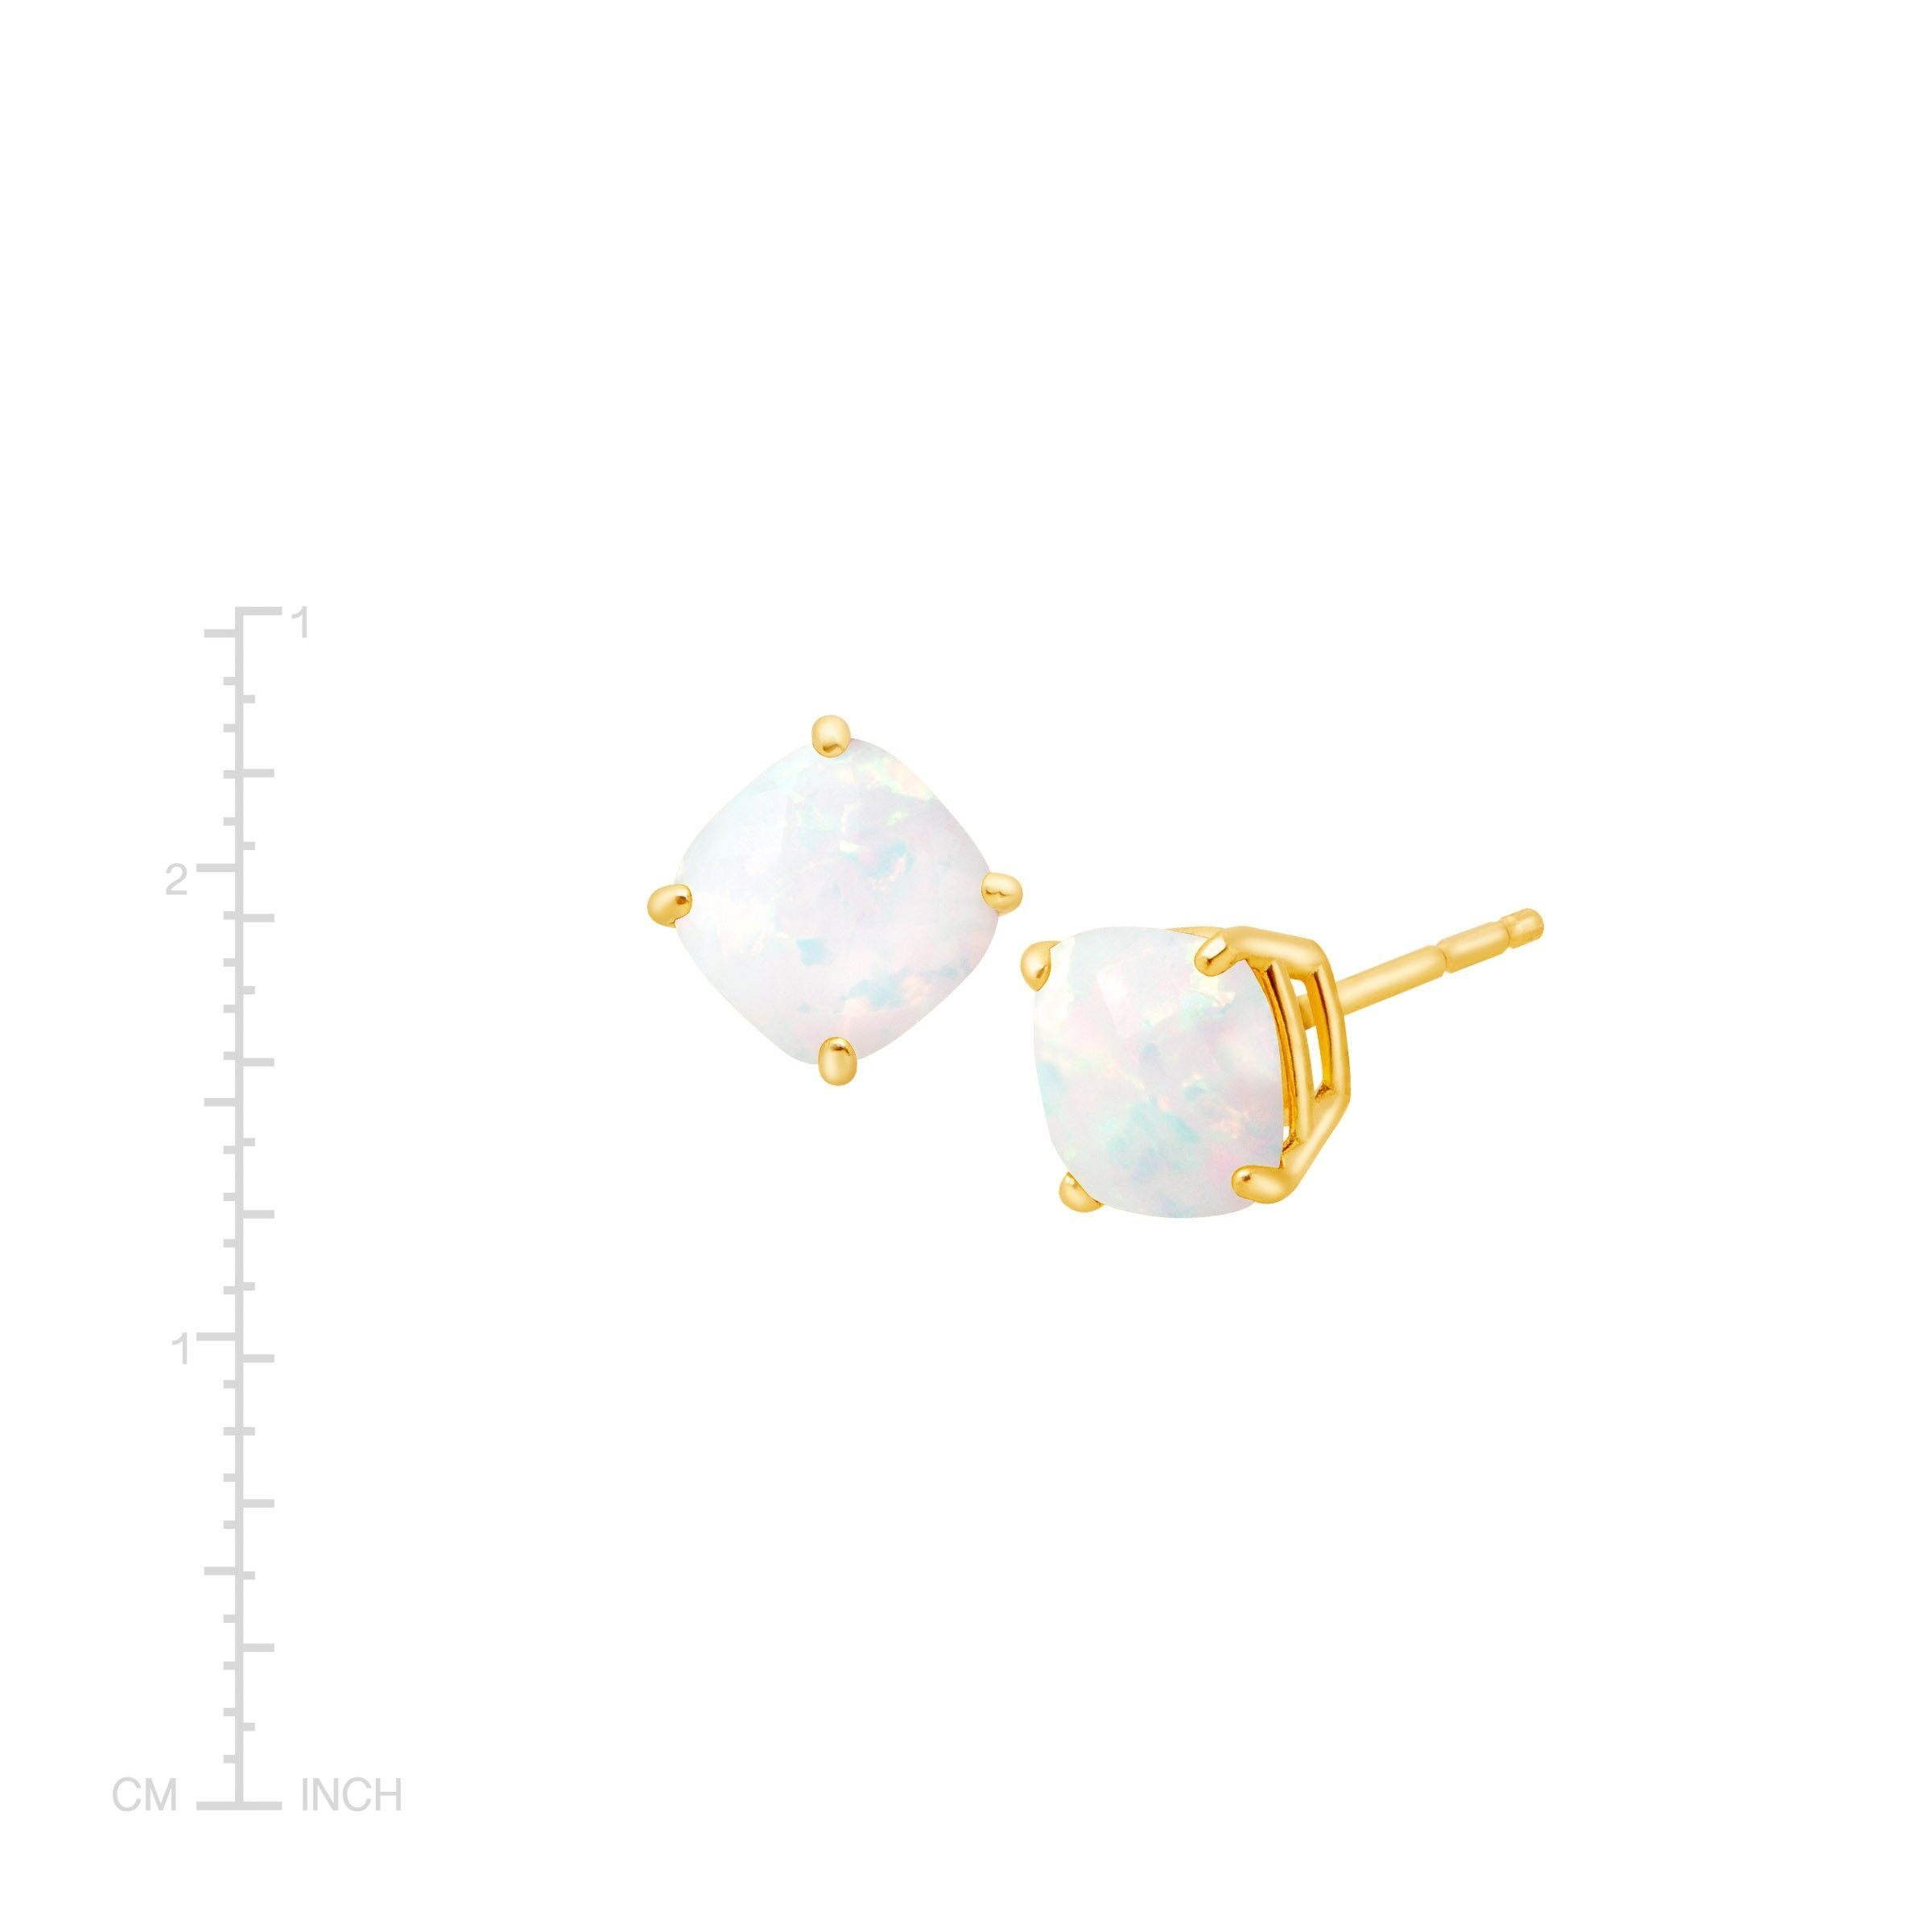 Cushion-Cut-Color-Stone-Stud-Earrings-in-14K-Gold thumbnail 28